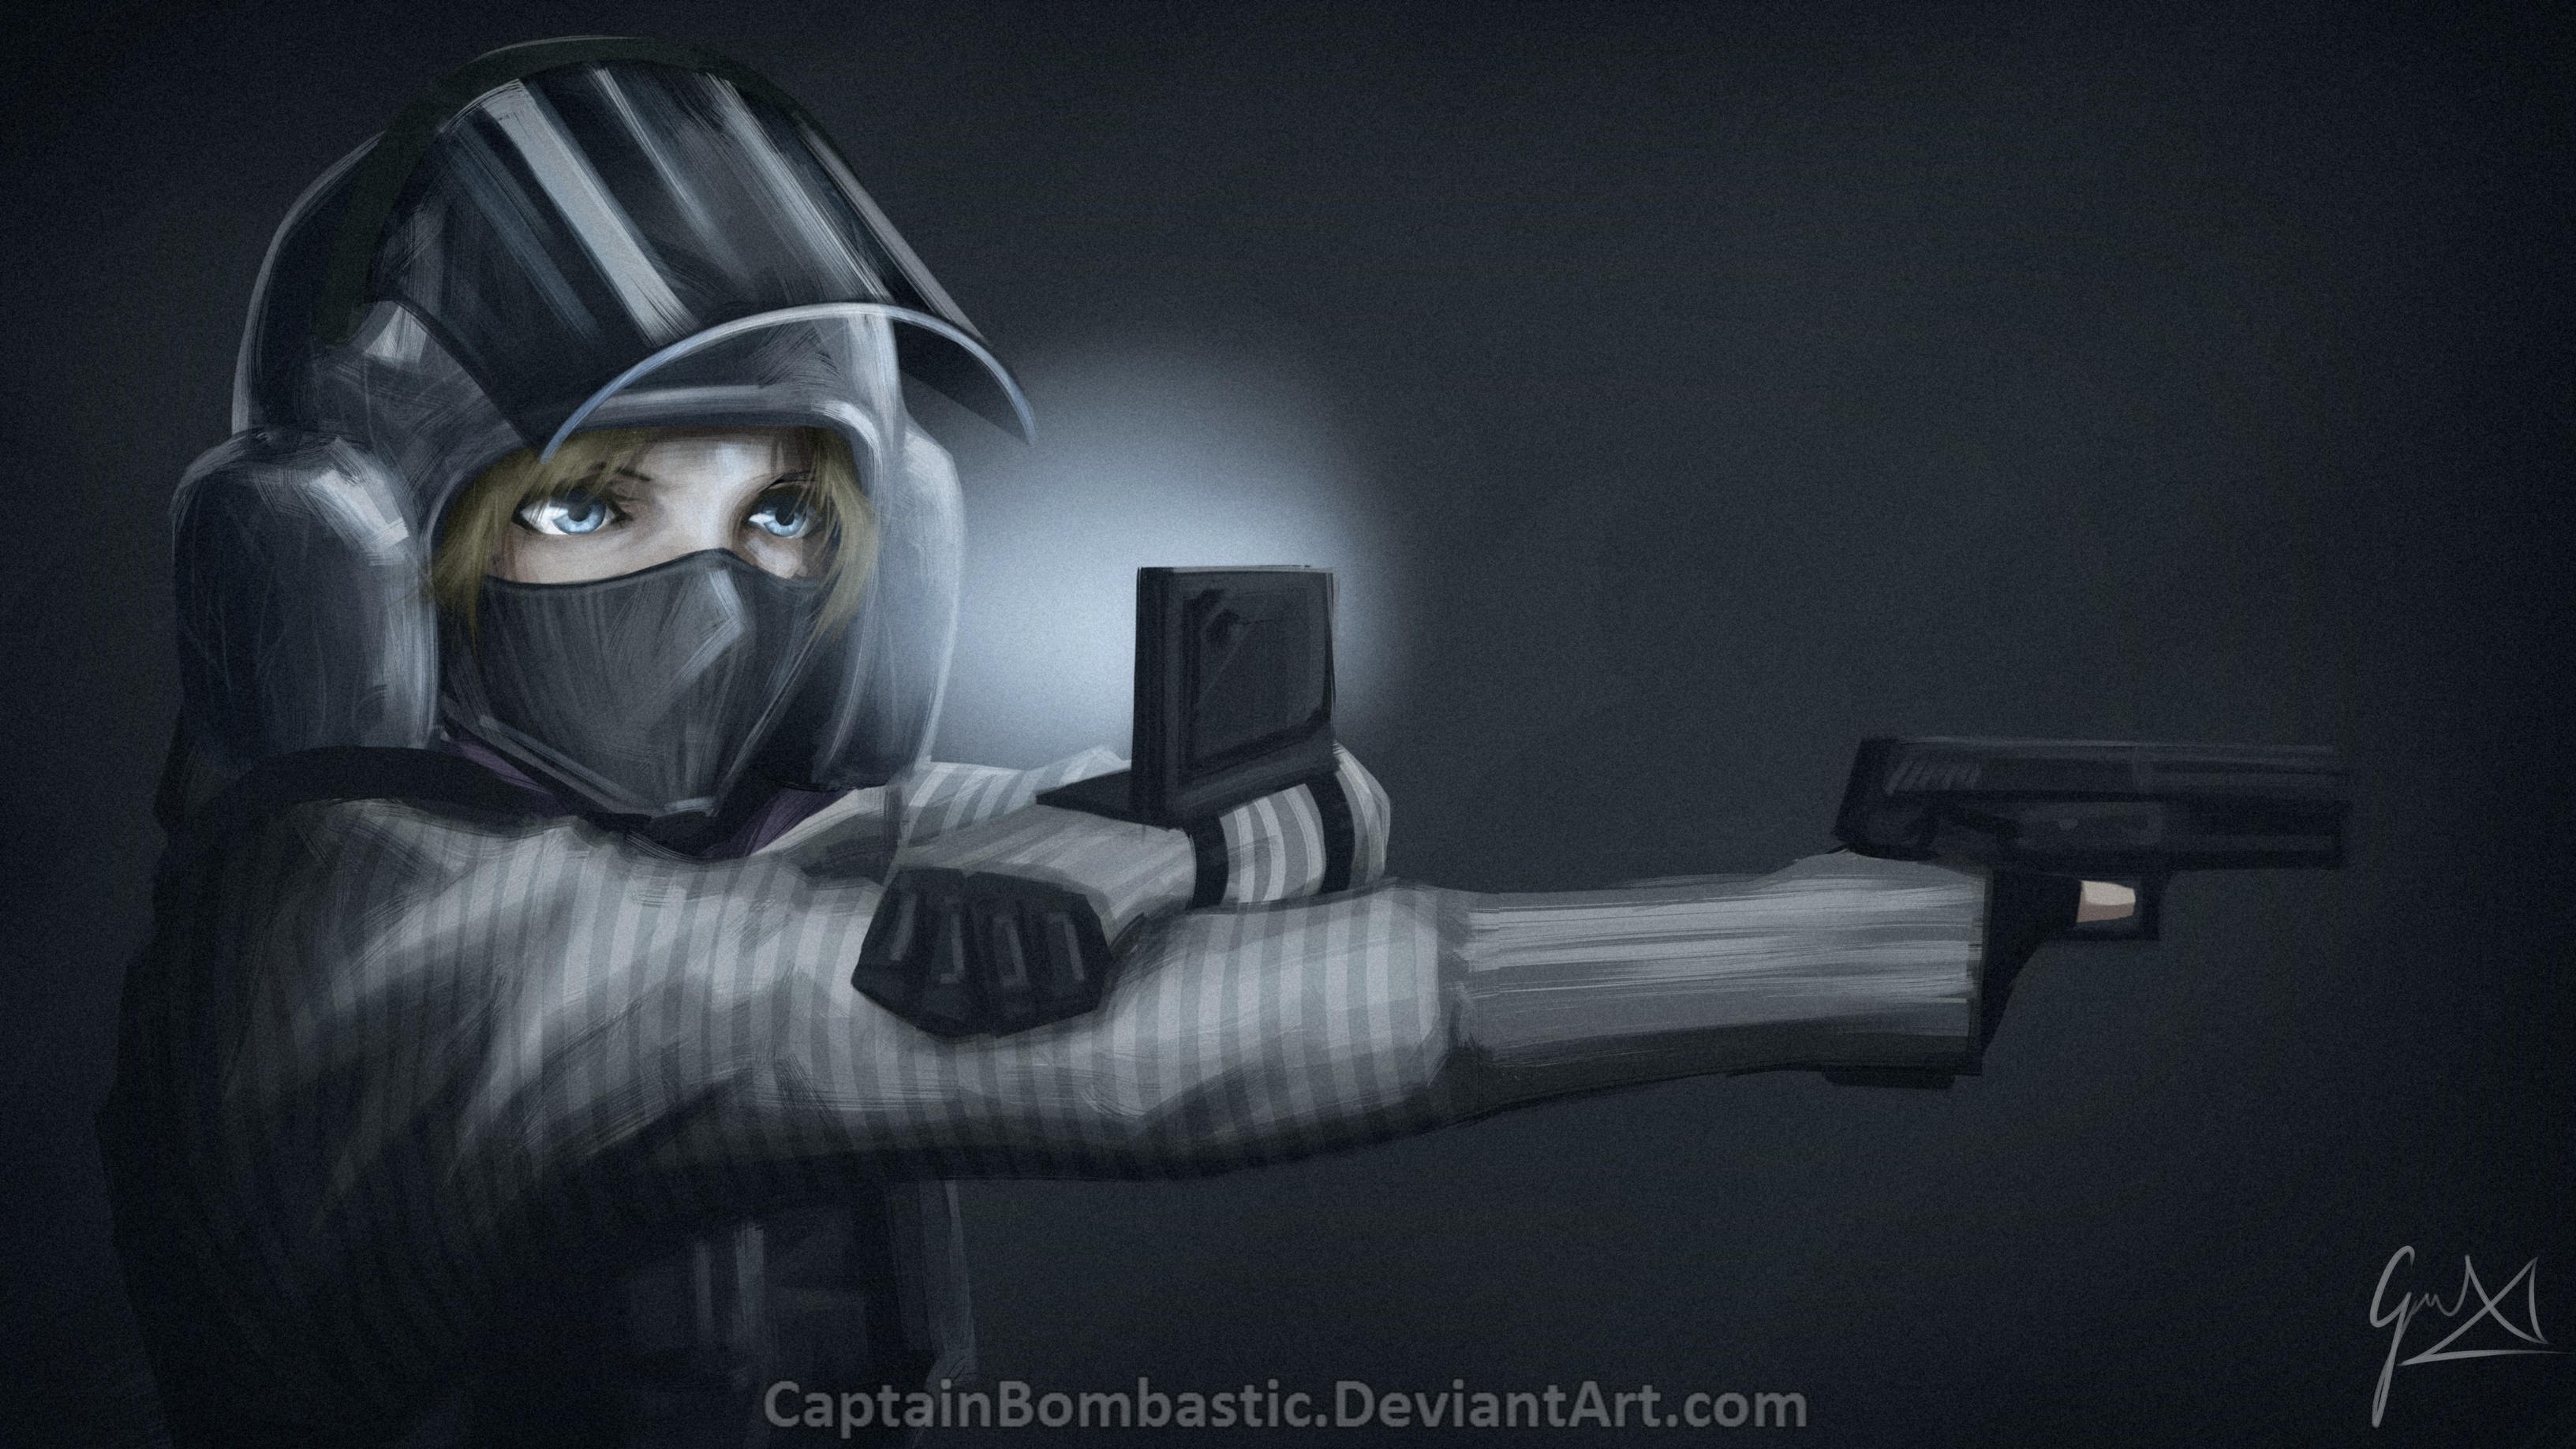 Rainbow Six: Siege - IQ by CaptainBombastic on DeviantArt